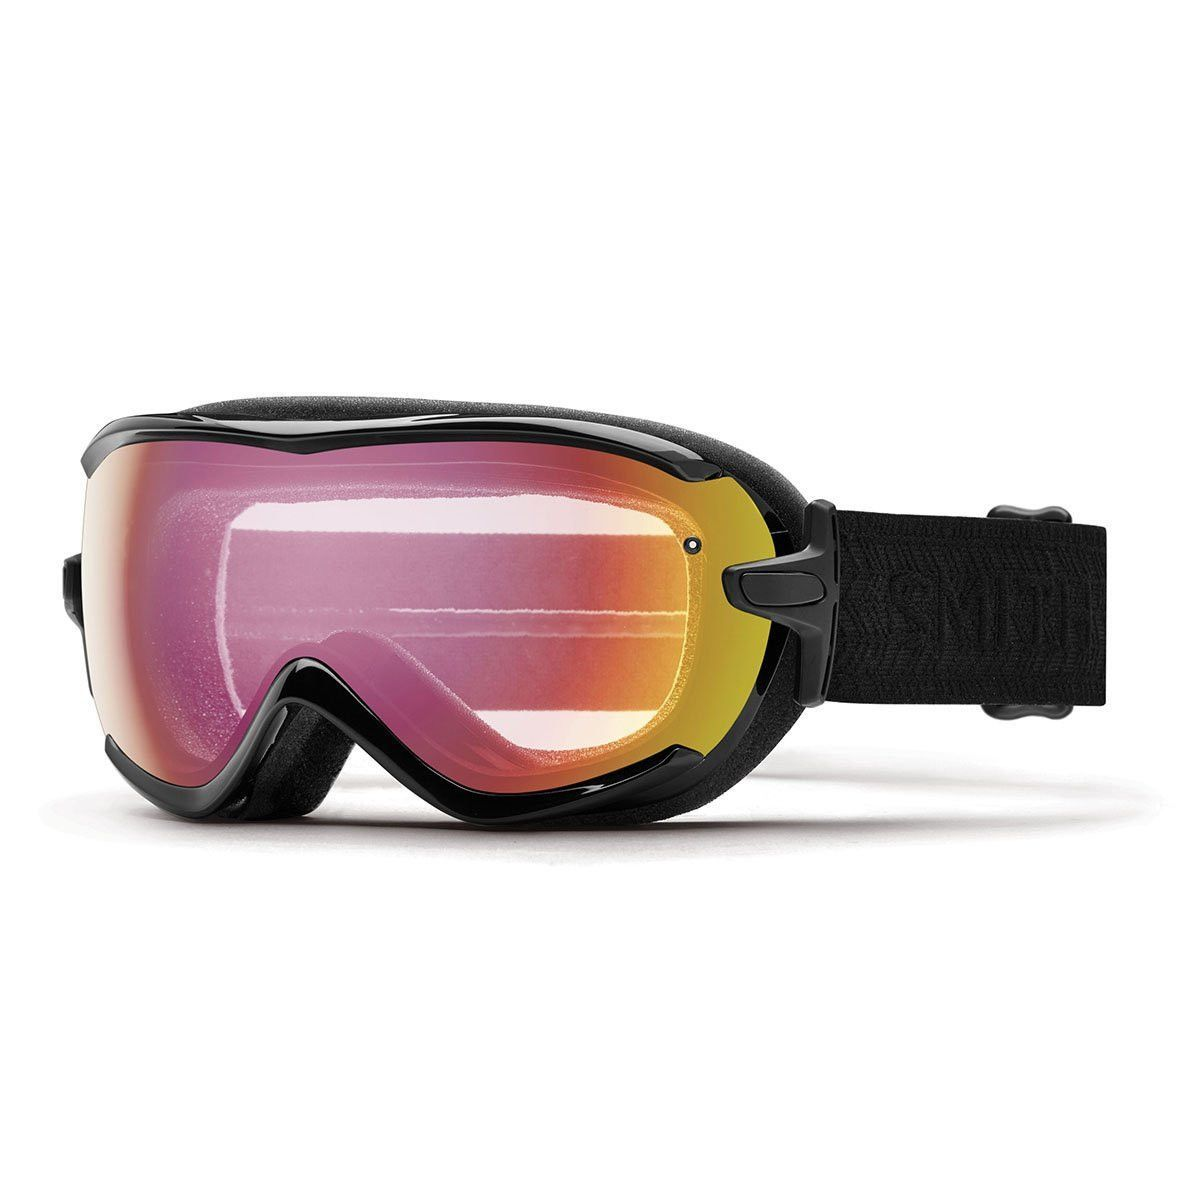 b9f506cad55 Smith Optics Virtue Adult Snowmobile Goggles Eyewear Black Eclipse    Photochromic Red Sensor Mirror